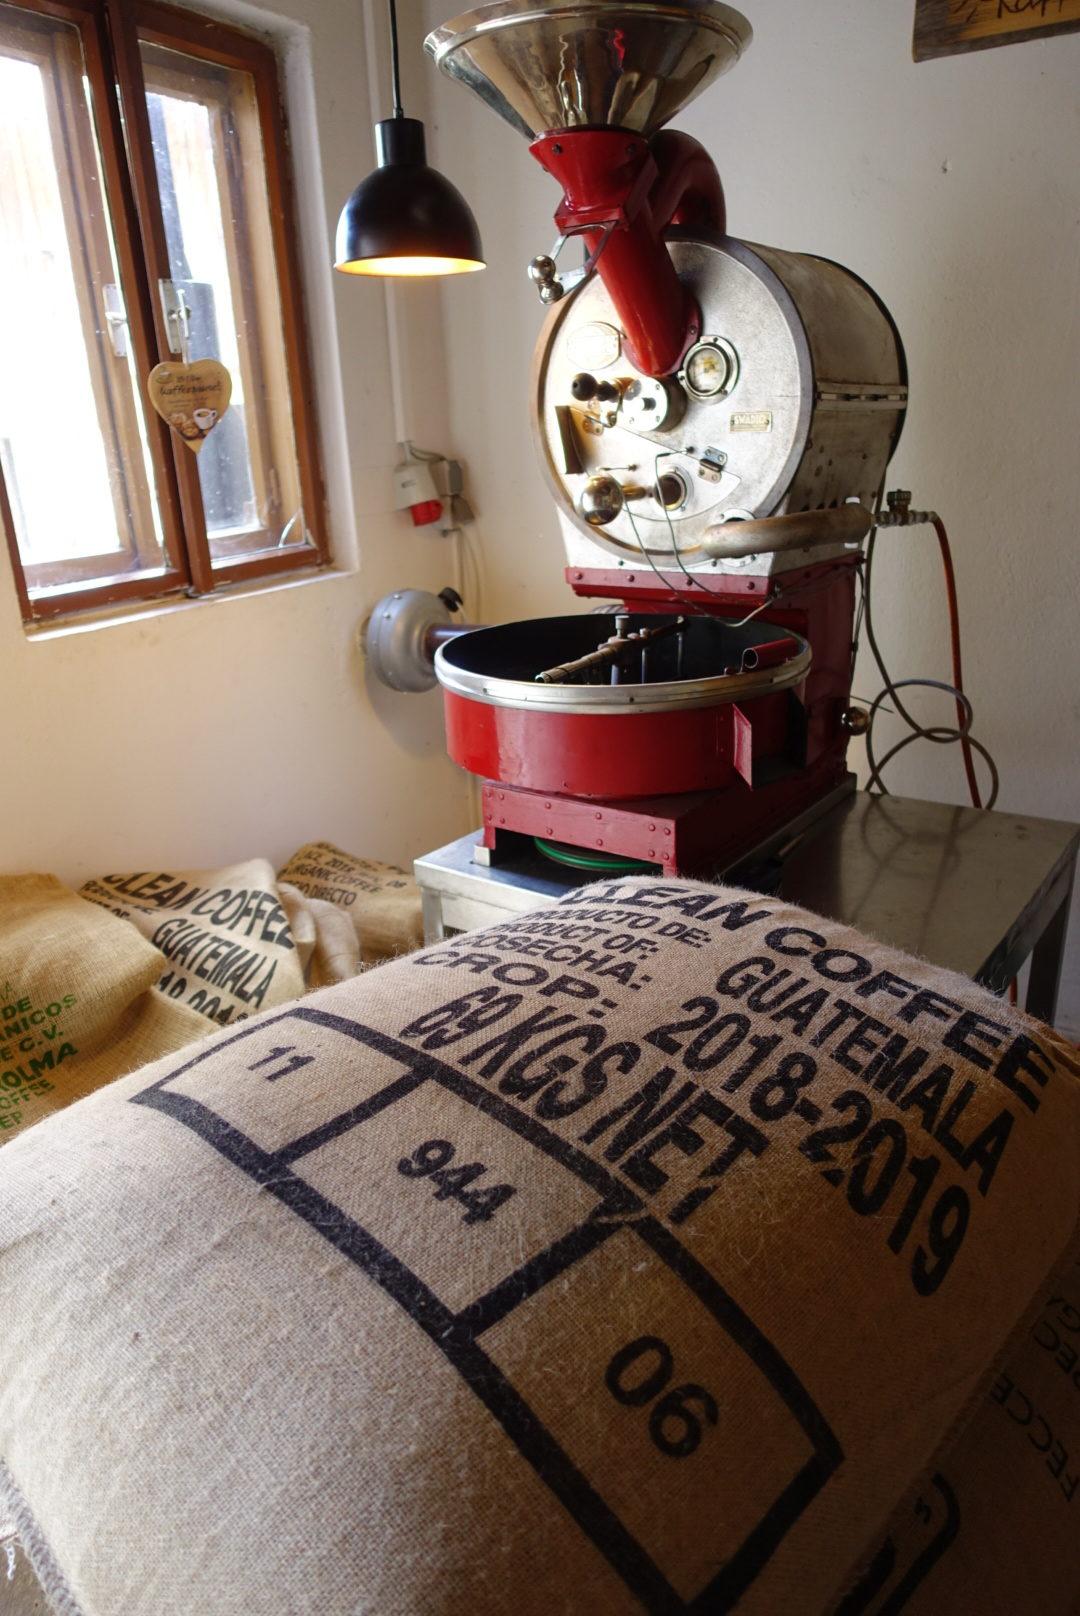 Guatemala KAffee de Mujeres